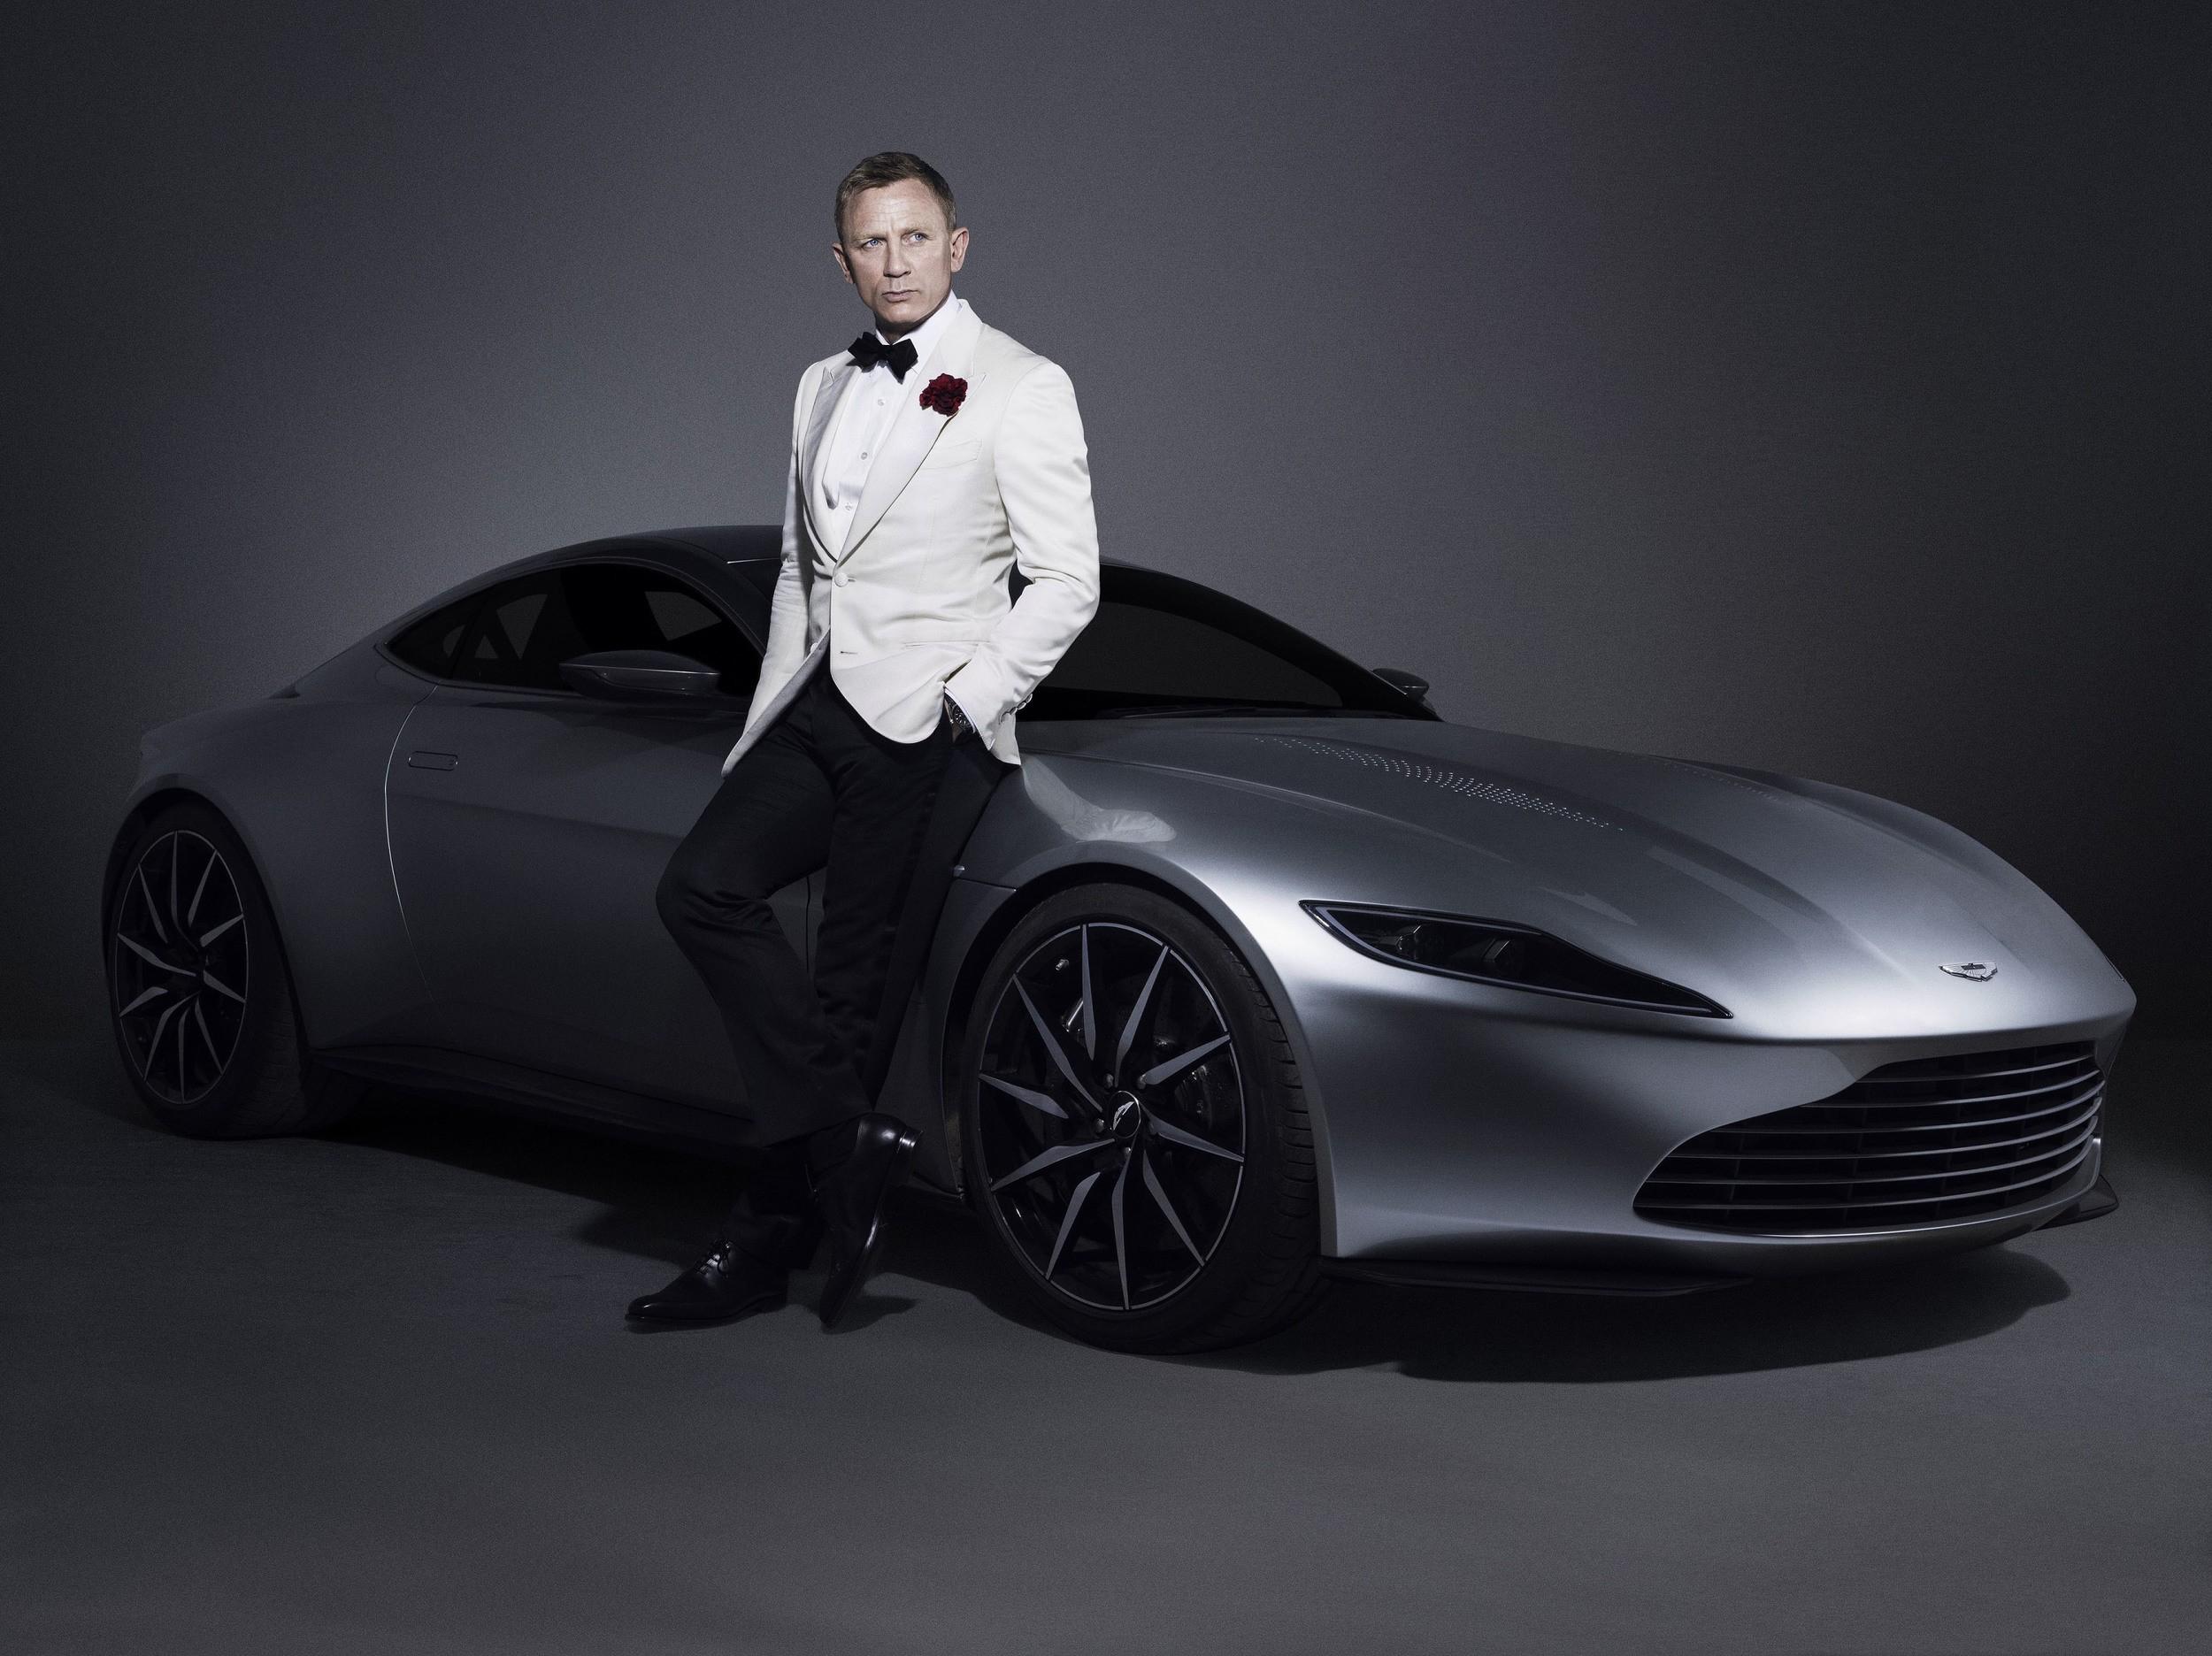 Wallpaper Men Actor Celebrity Daniel Craig James Bond 007